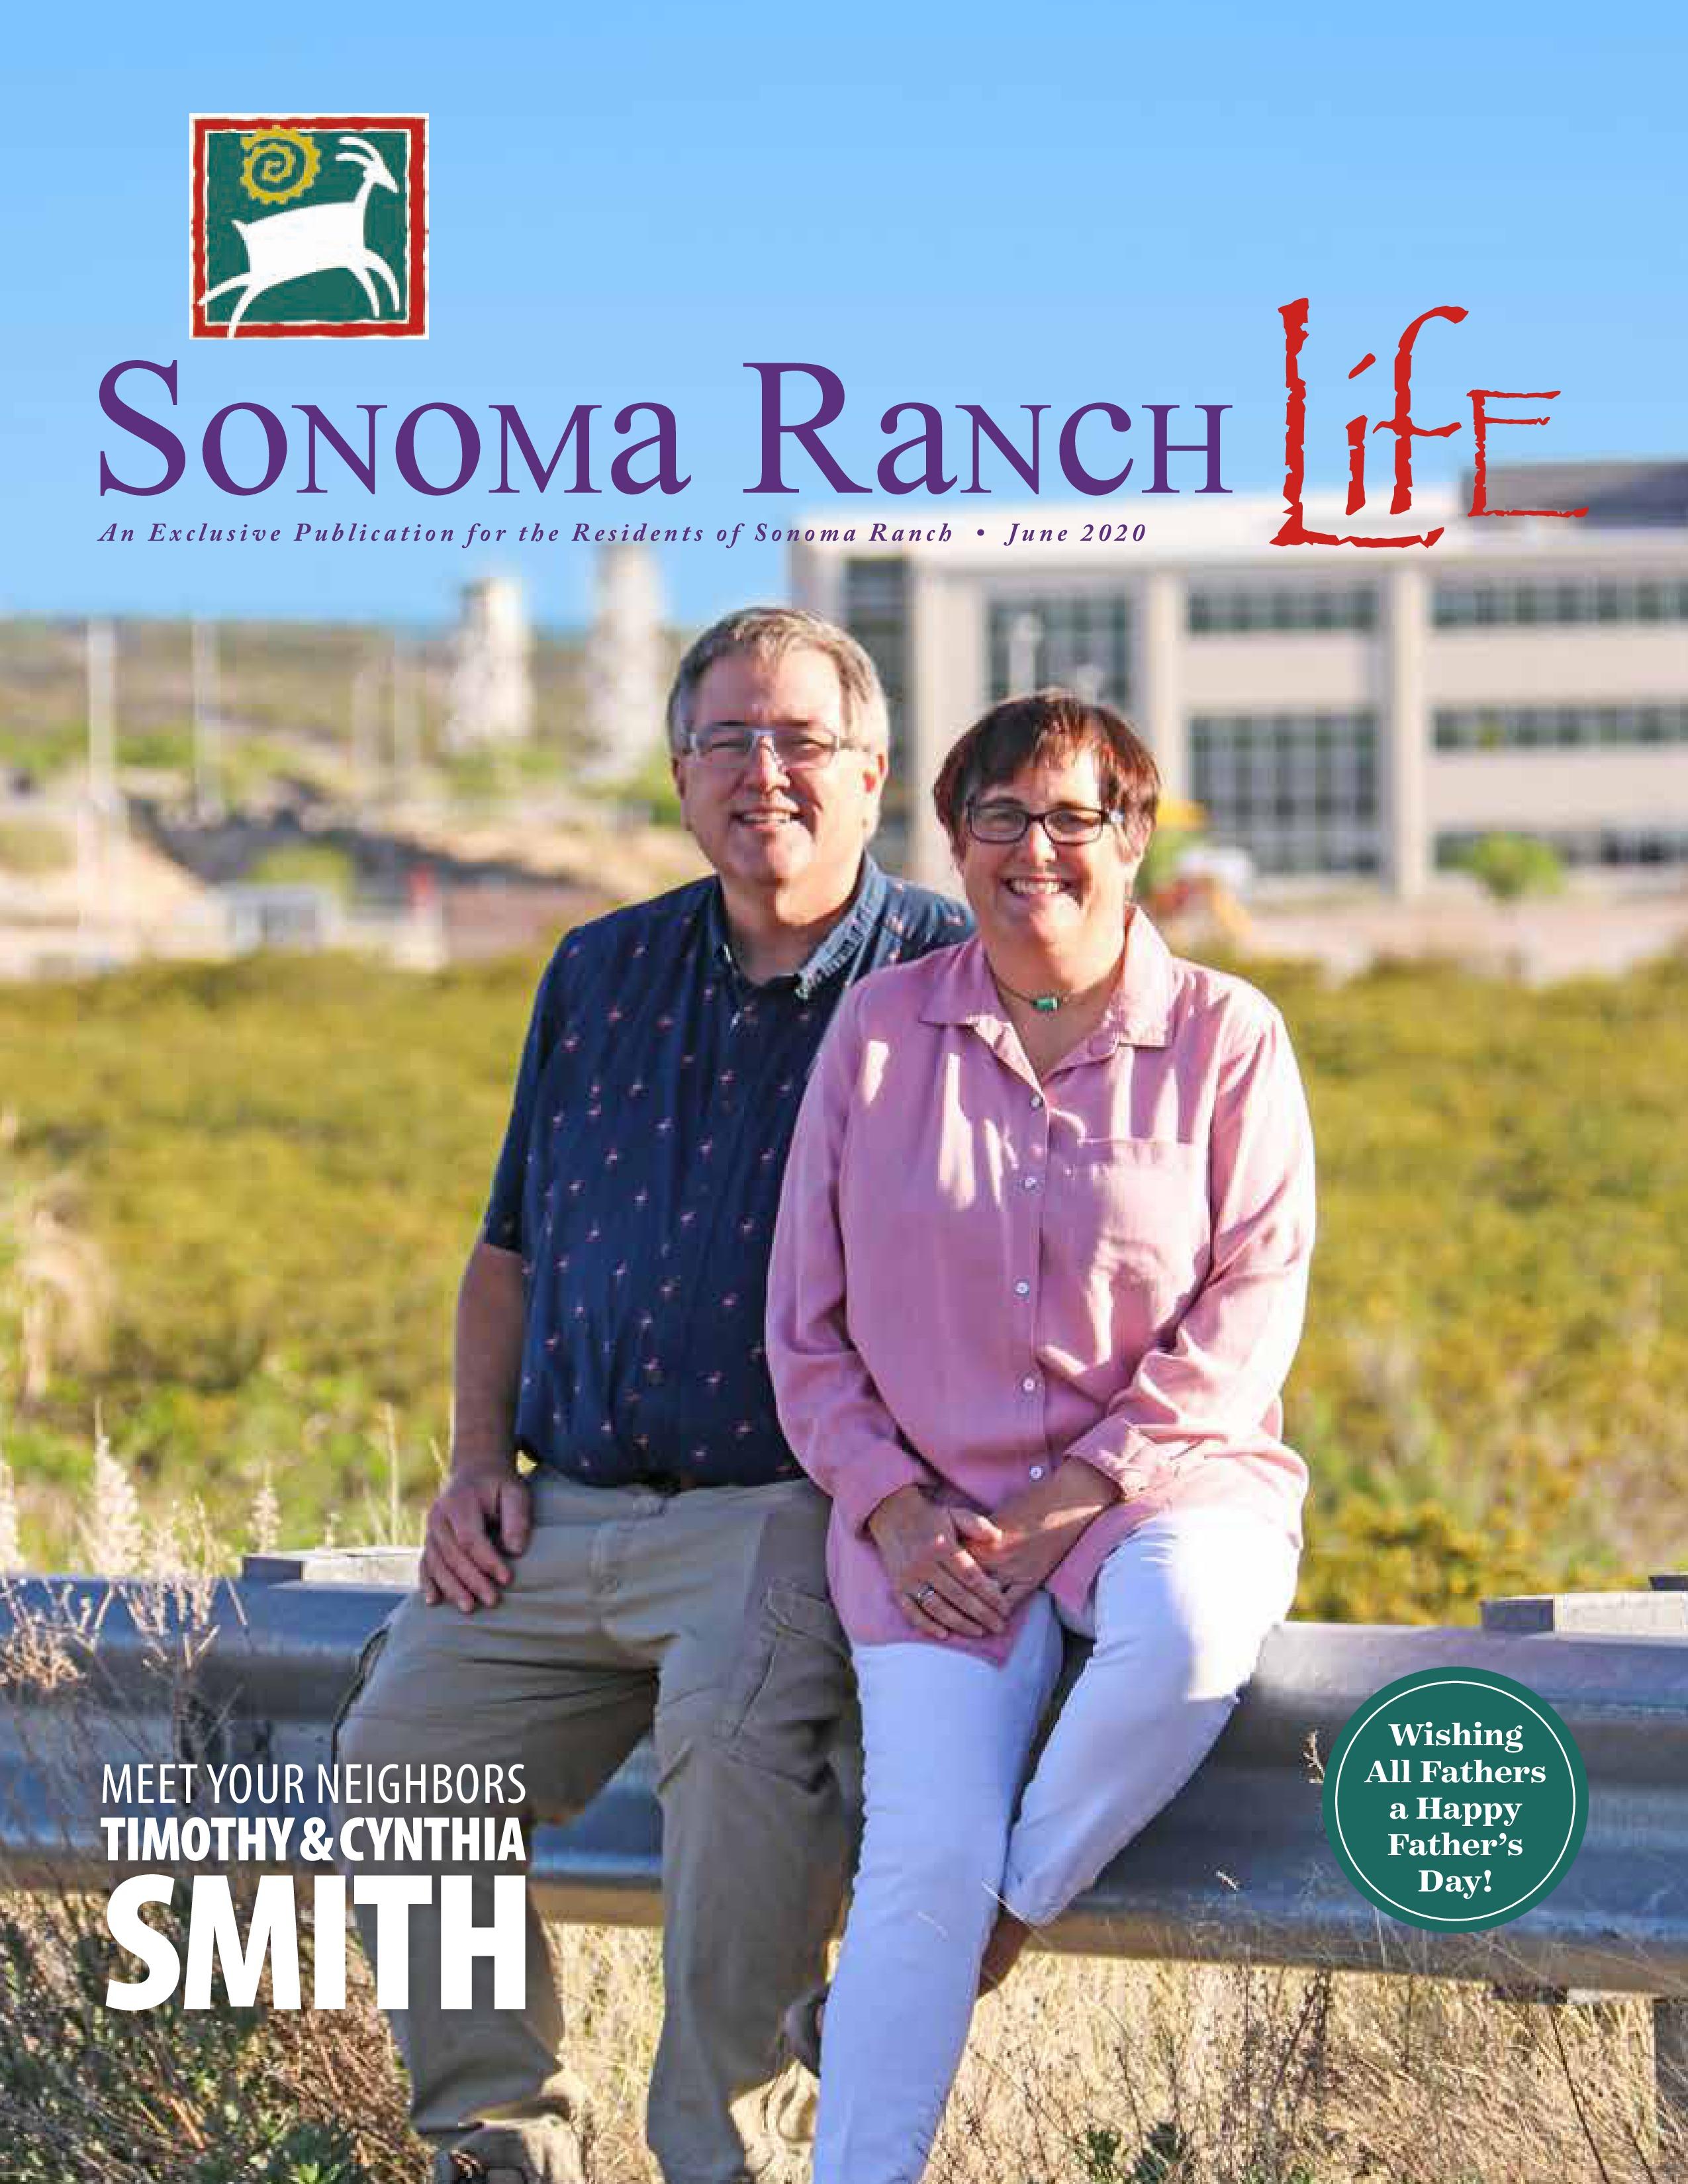 Jun 2020 sonoma ranch life page 1